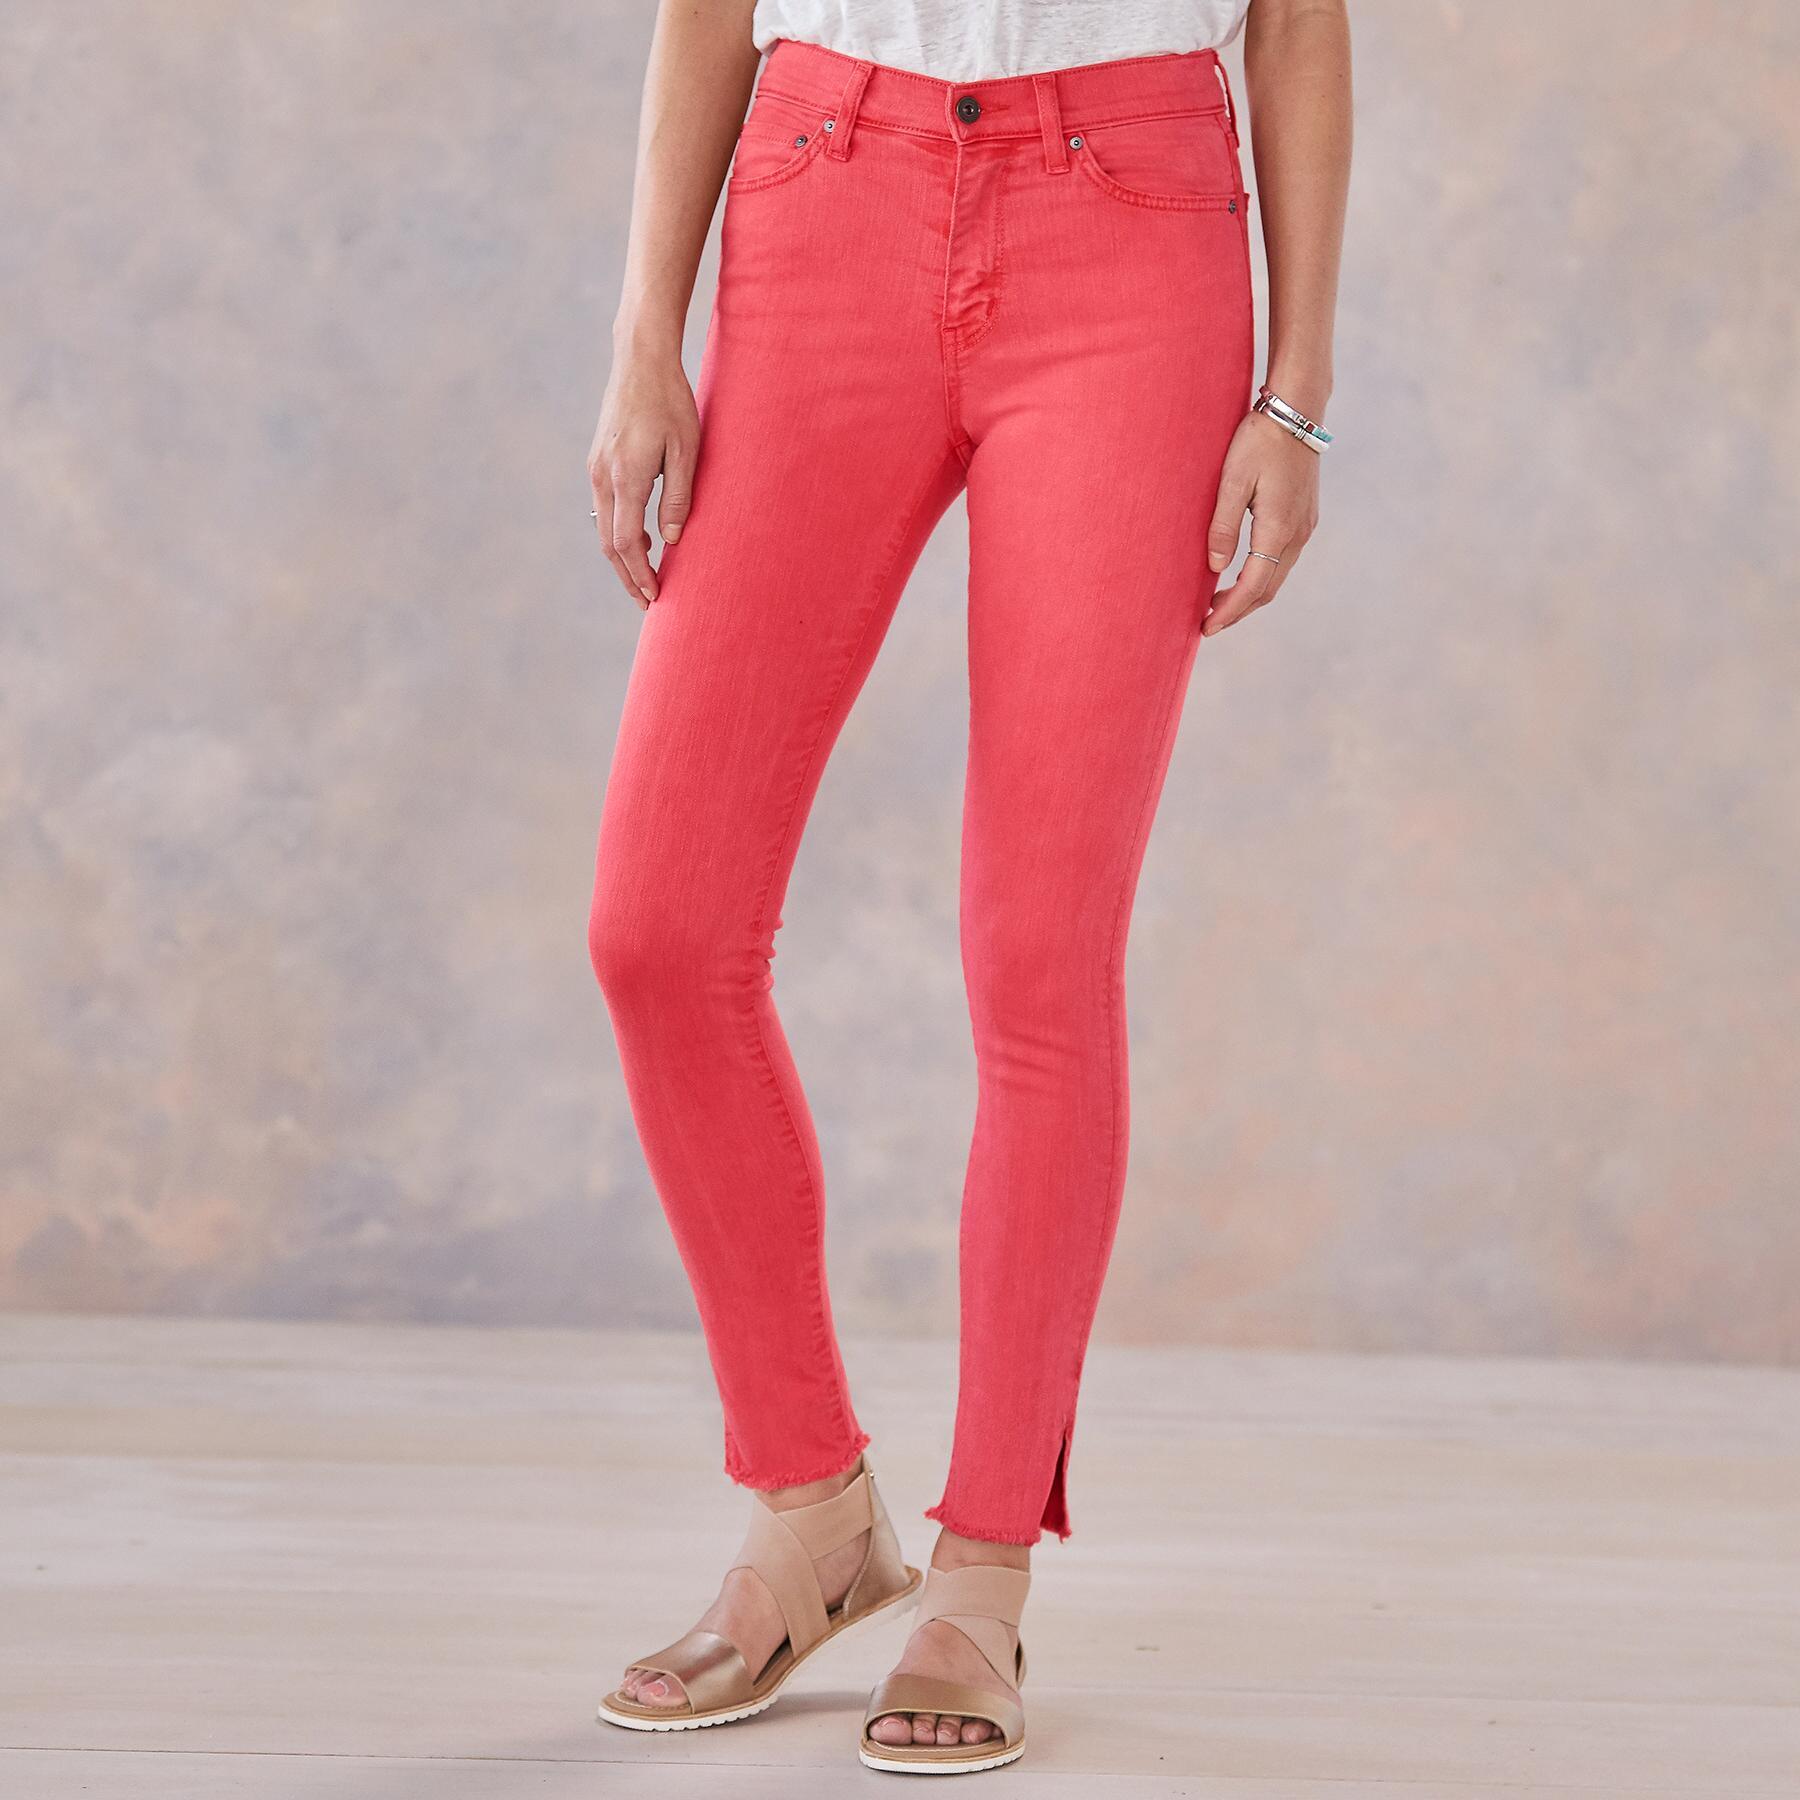 Gem Poppy Jeans